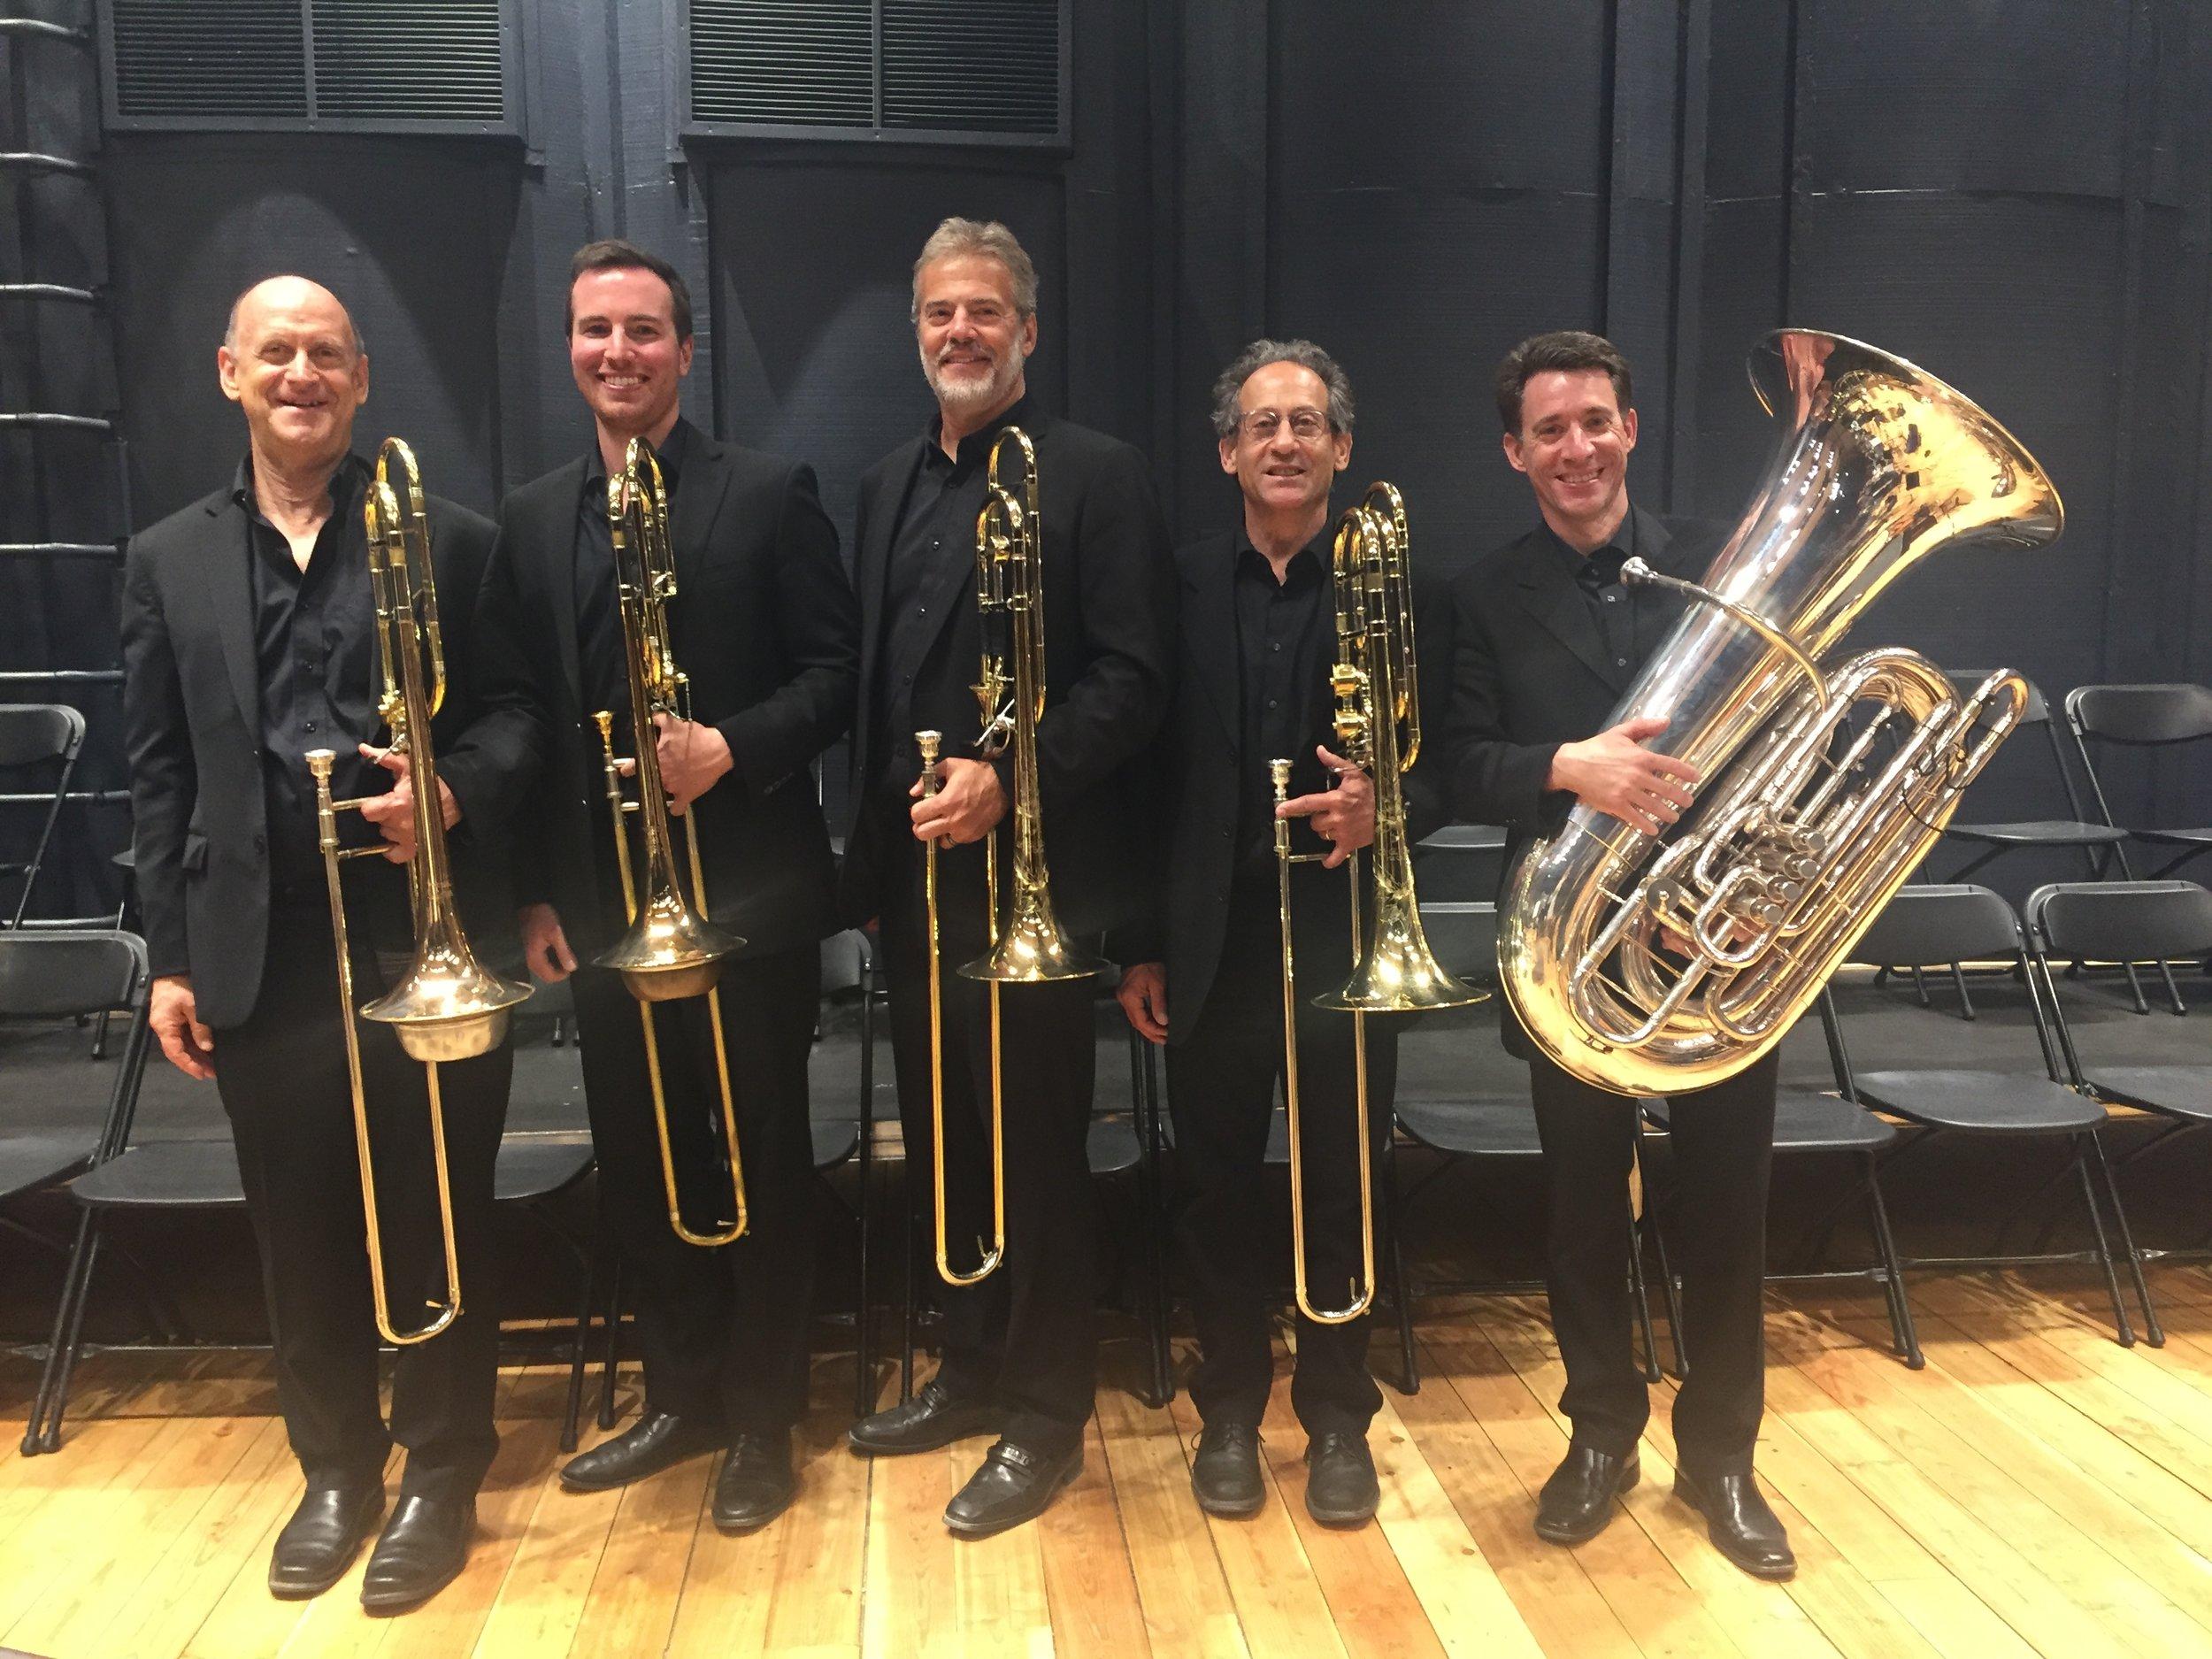 Michael Mulcahy, Jay Evans, Jared Rodin, Craig Knox, after performing Mahler's Third Symphony at the Grand Teton Music Festival